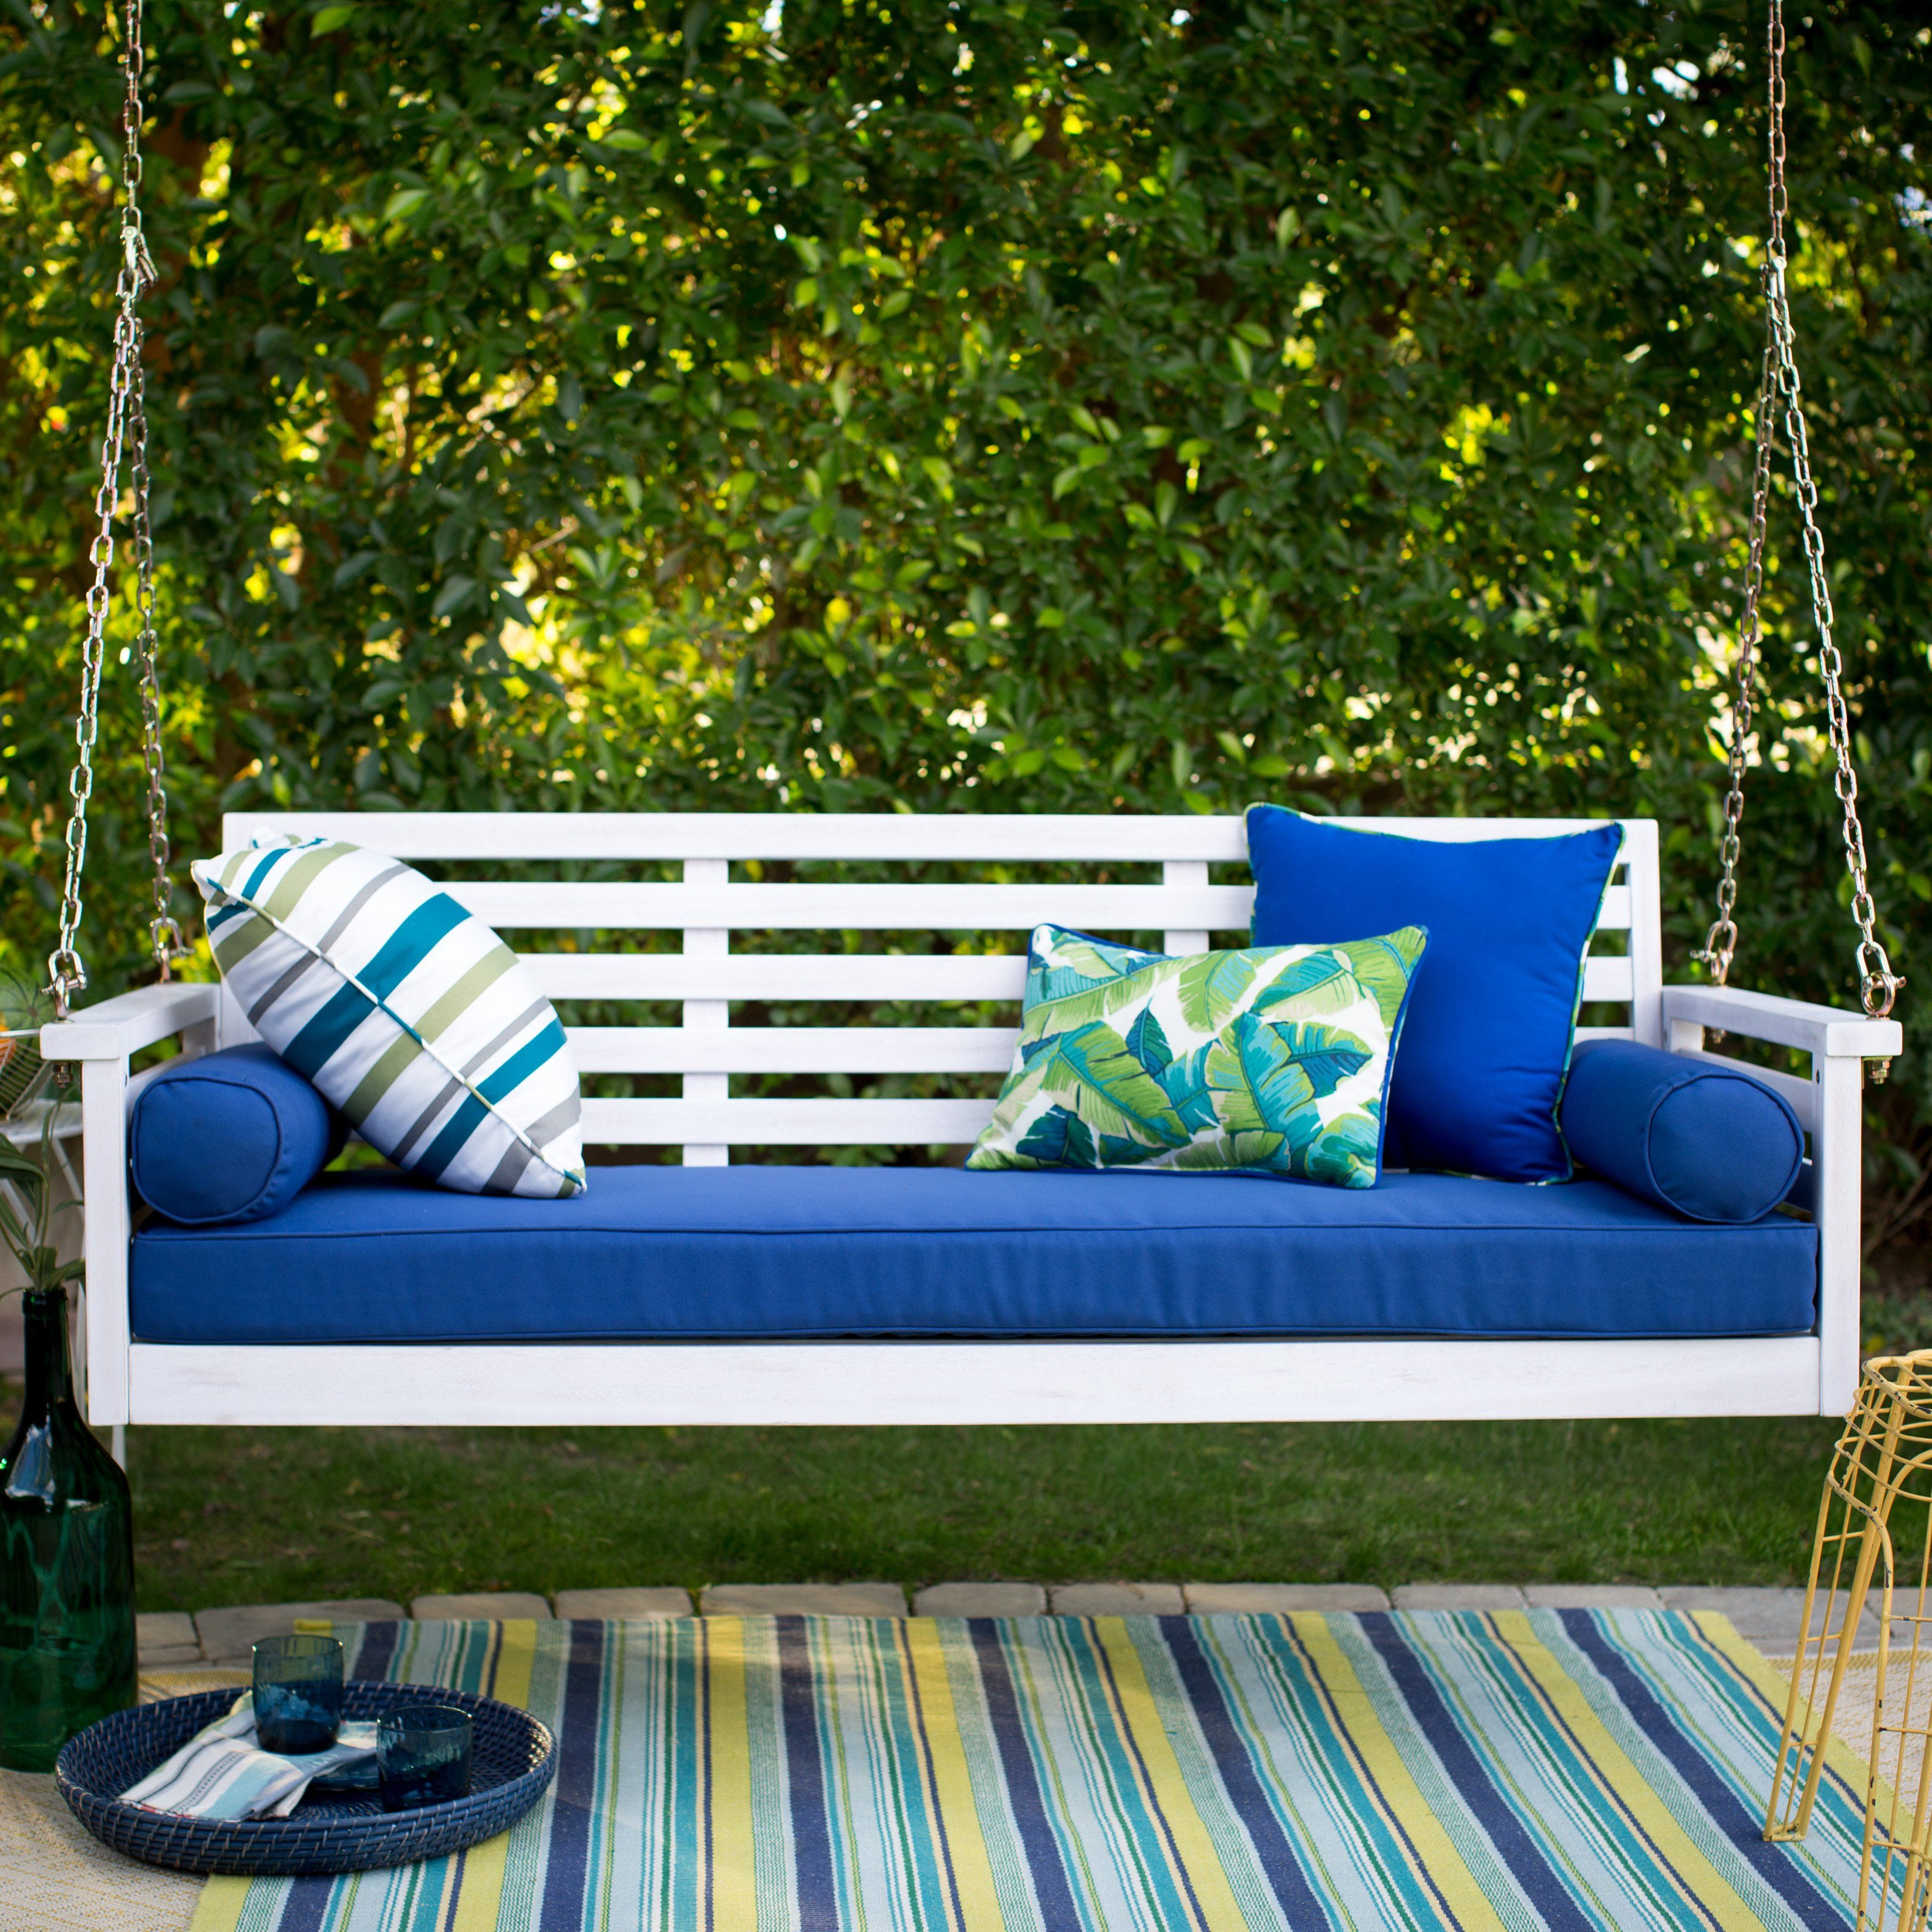 belham living brighton beach deep seating porch swing bed with rh pinterest com